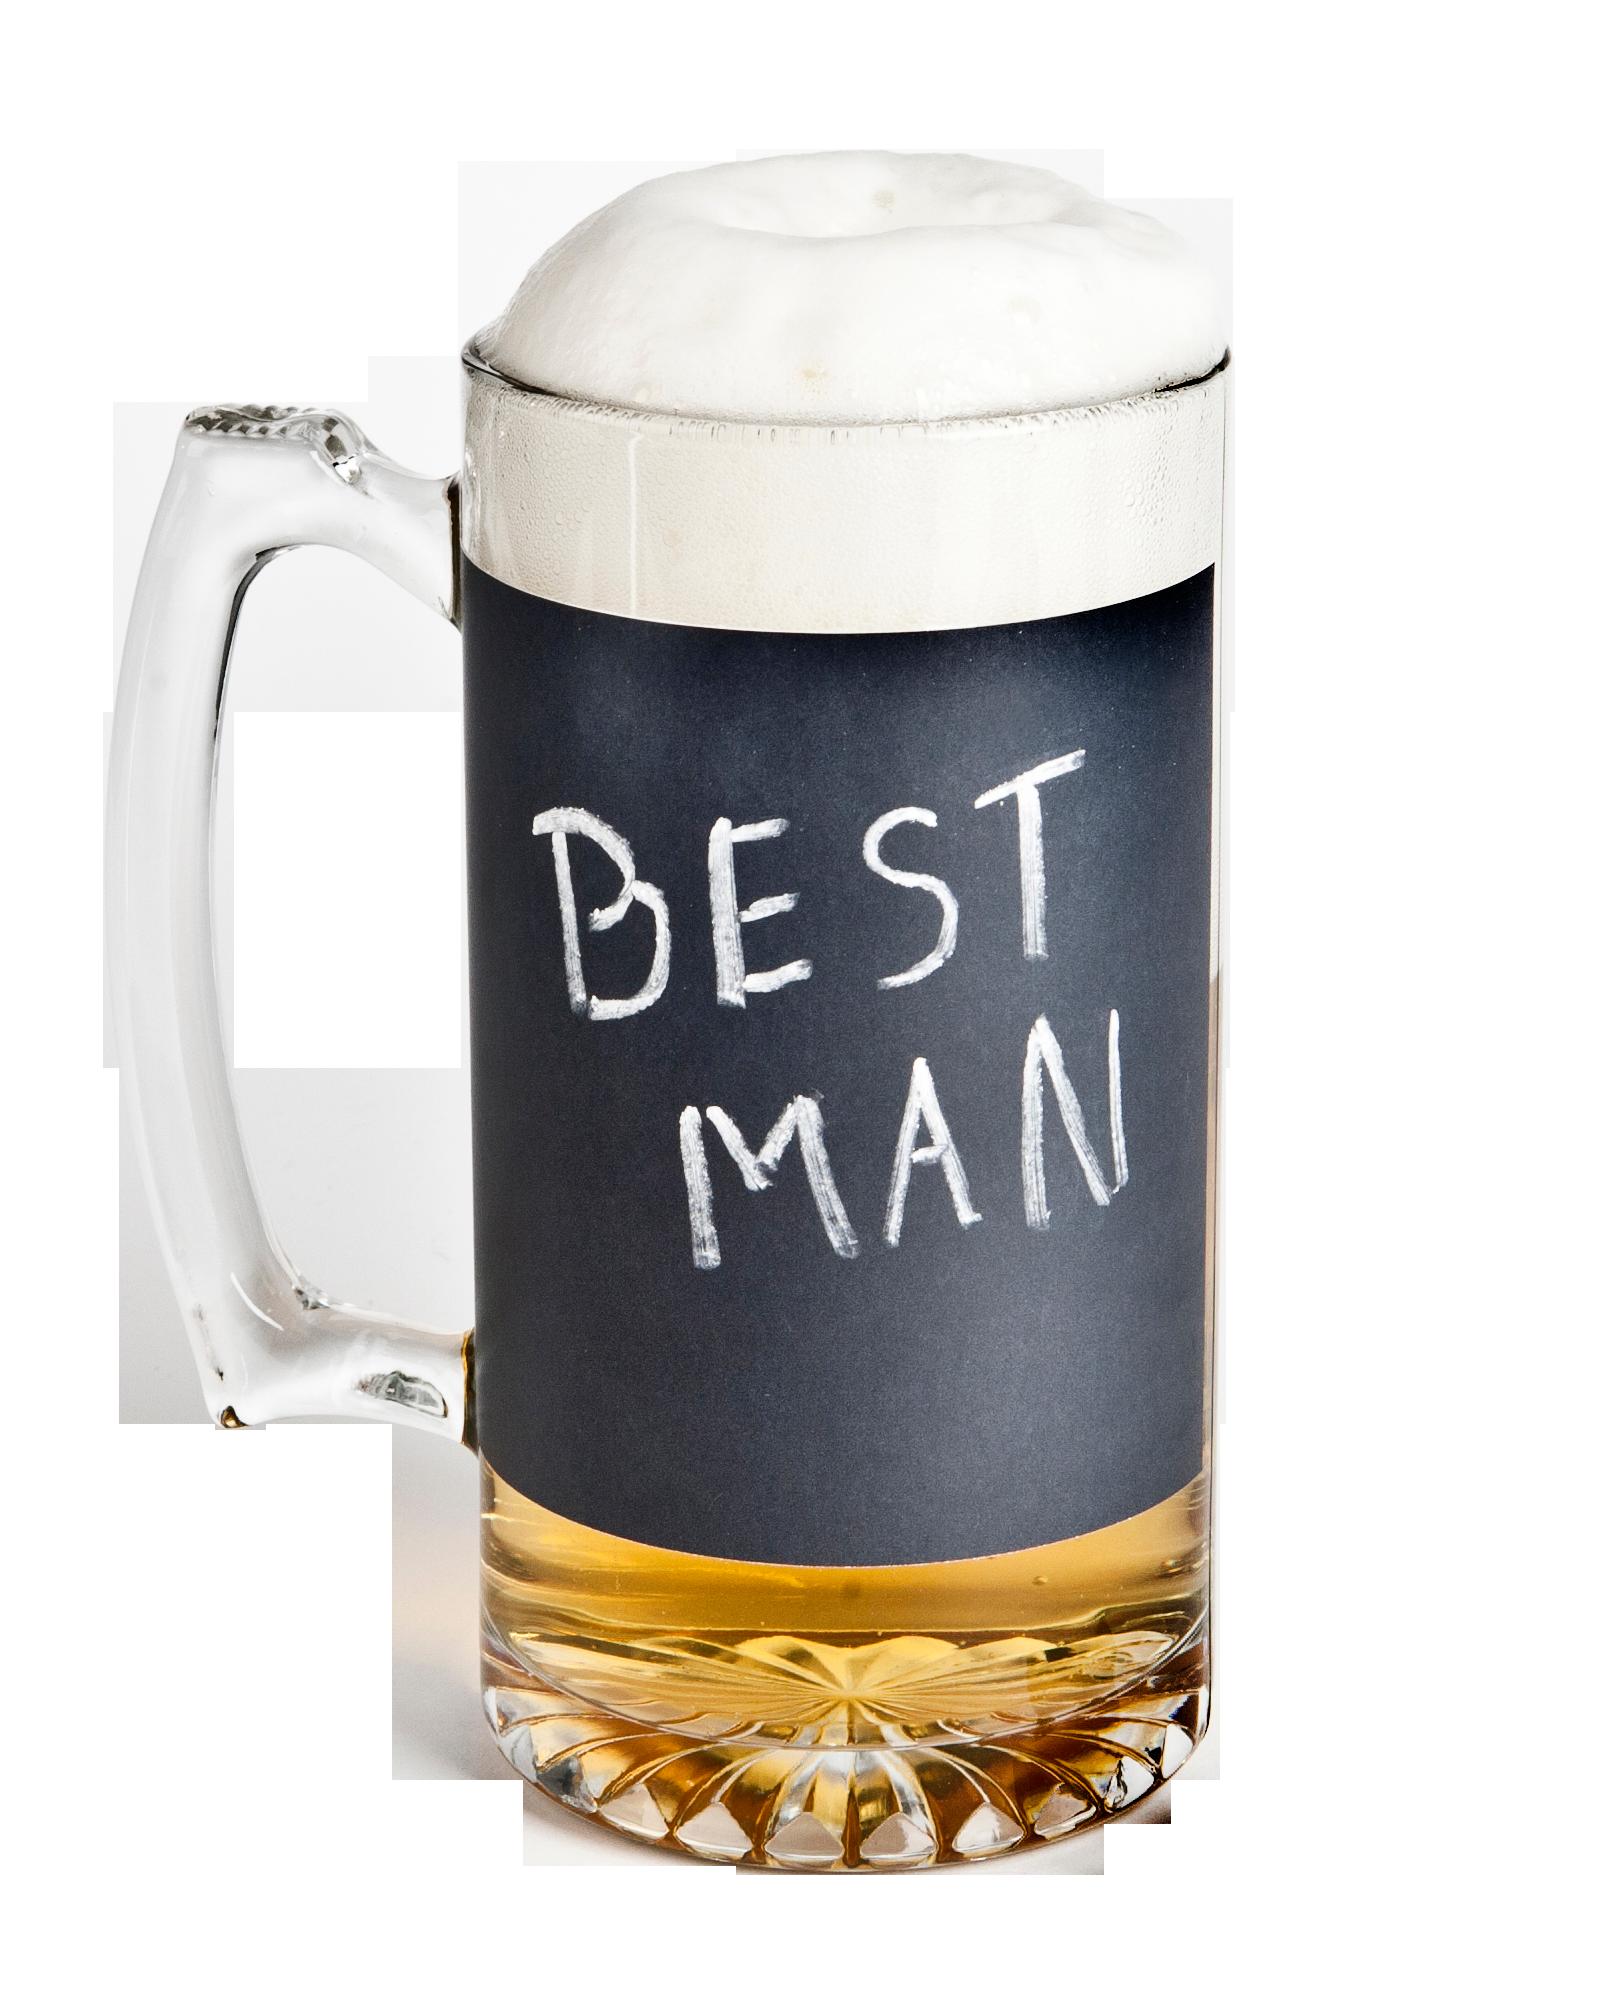 Chalkboard beer mug from TheManRegistry.com